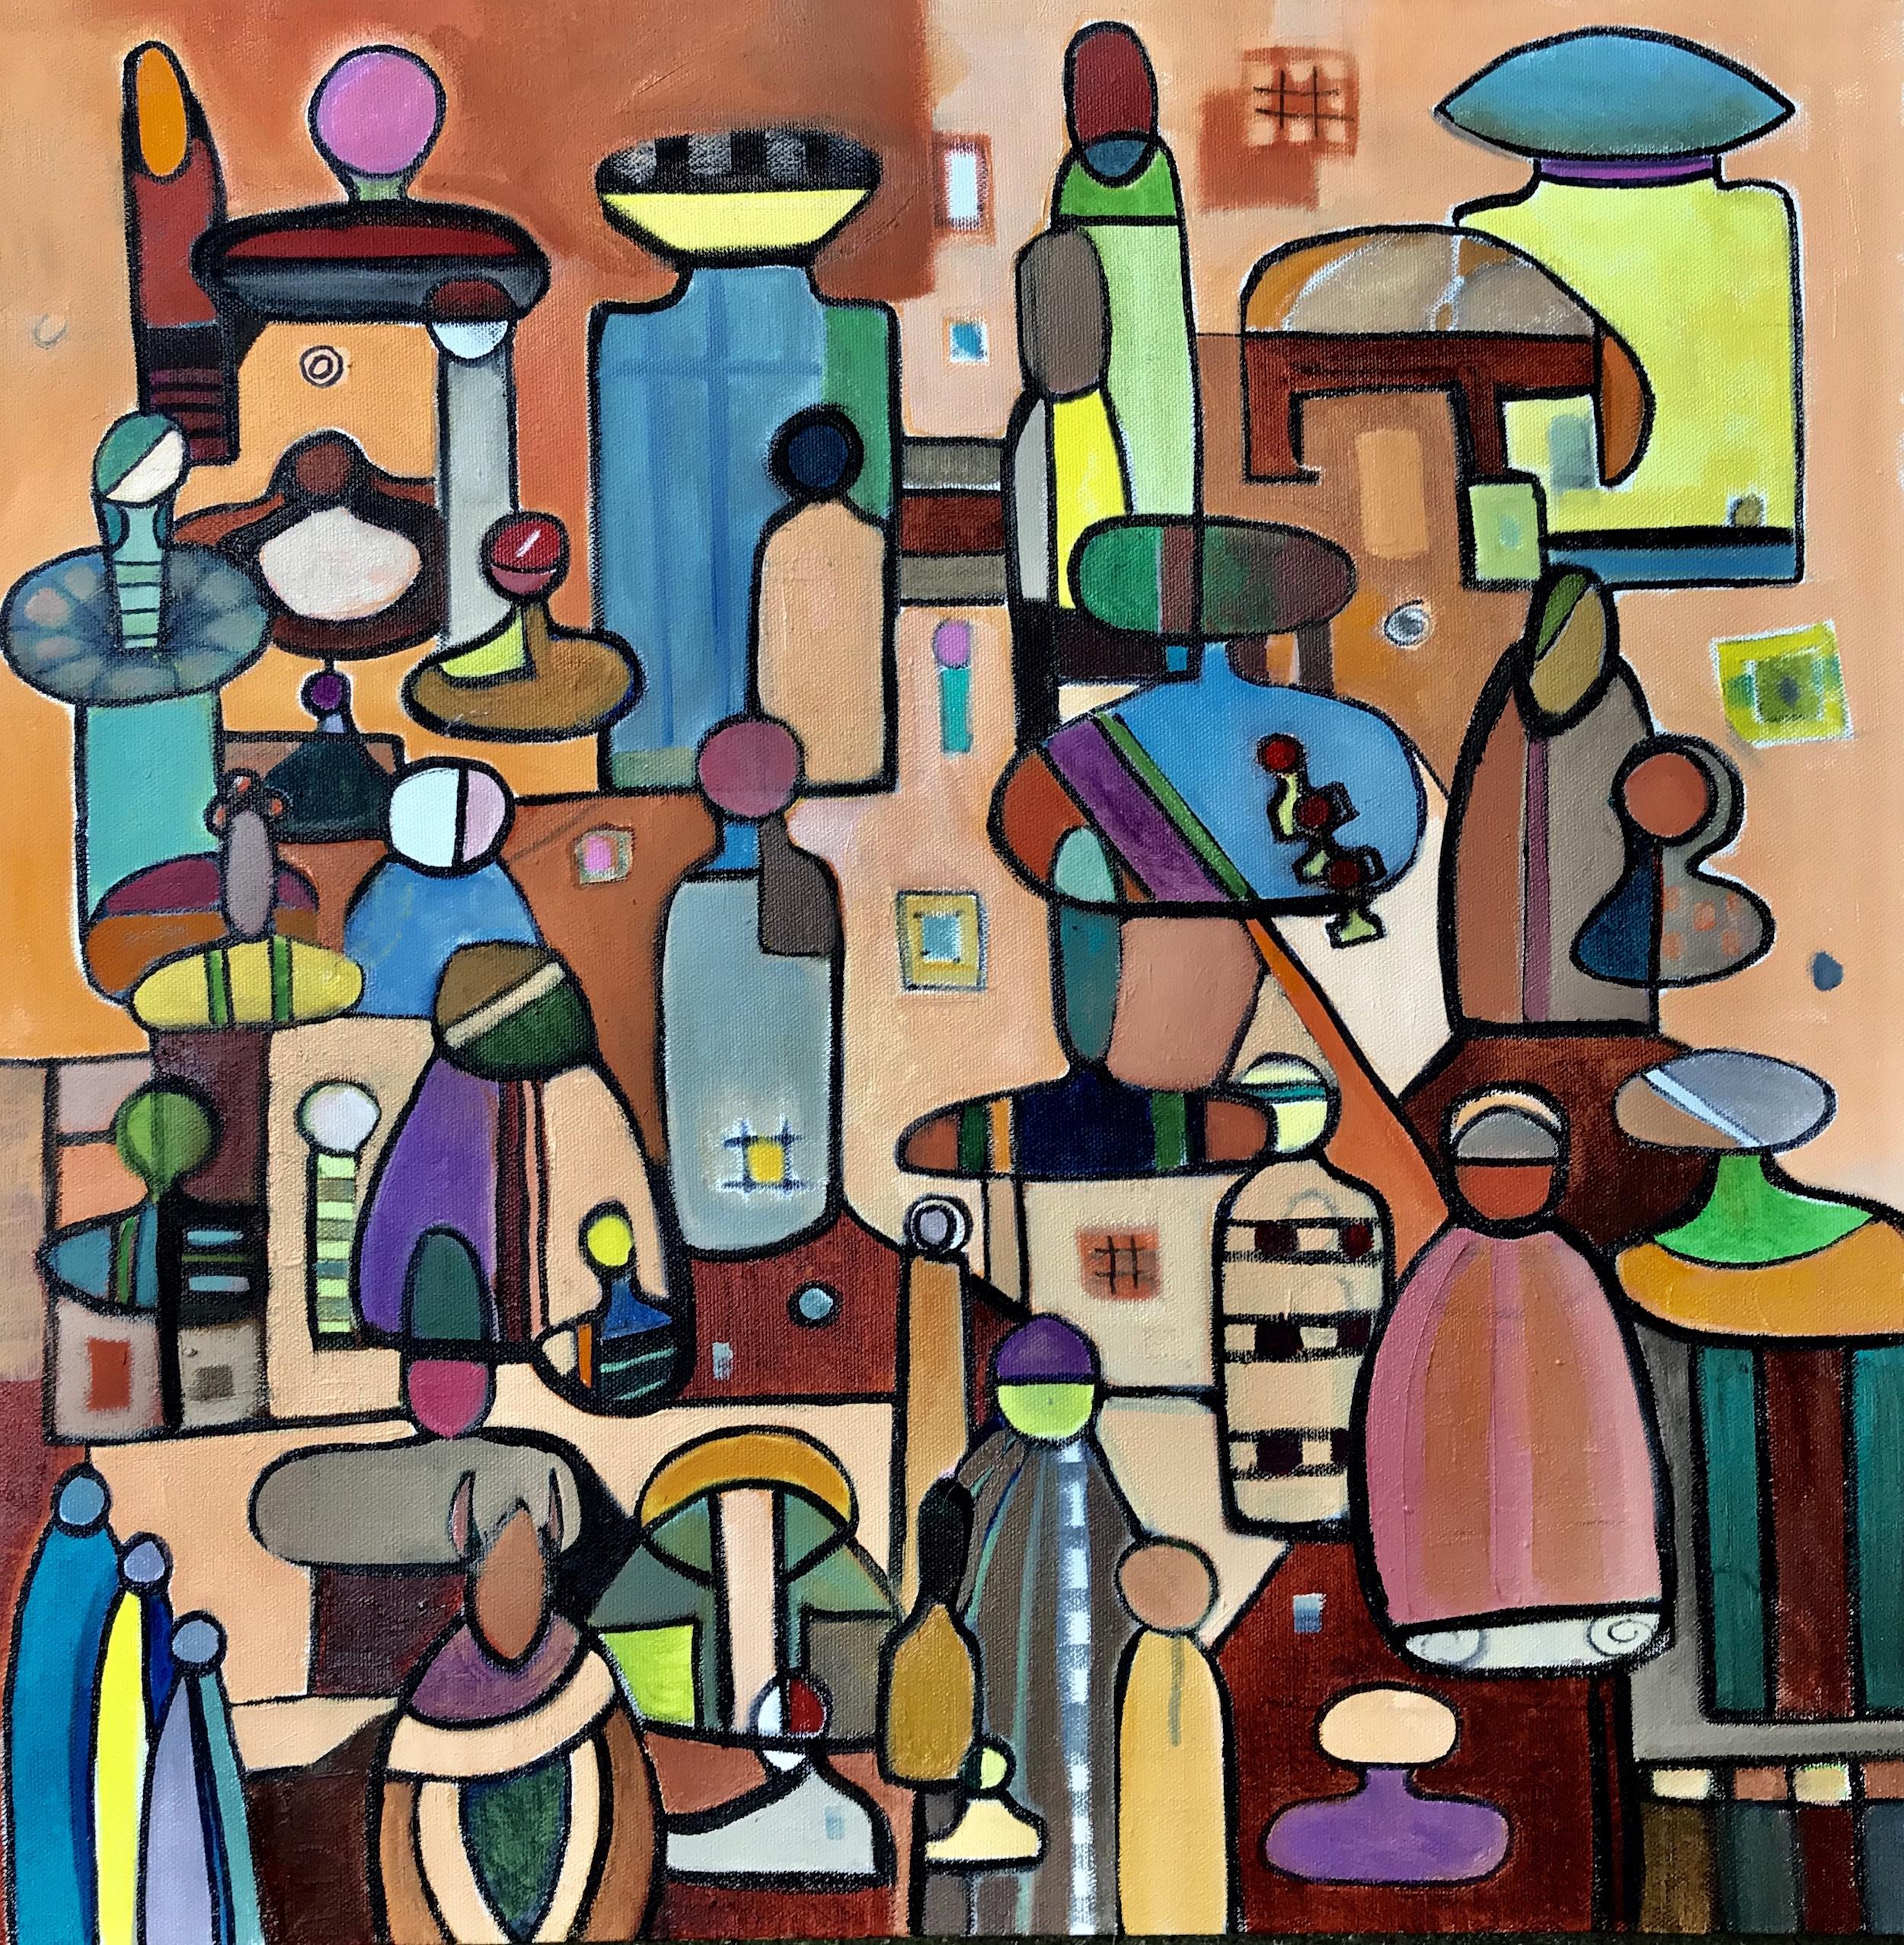 Harmony Series Diversity by Jane Mayer